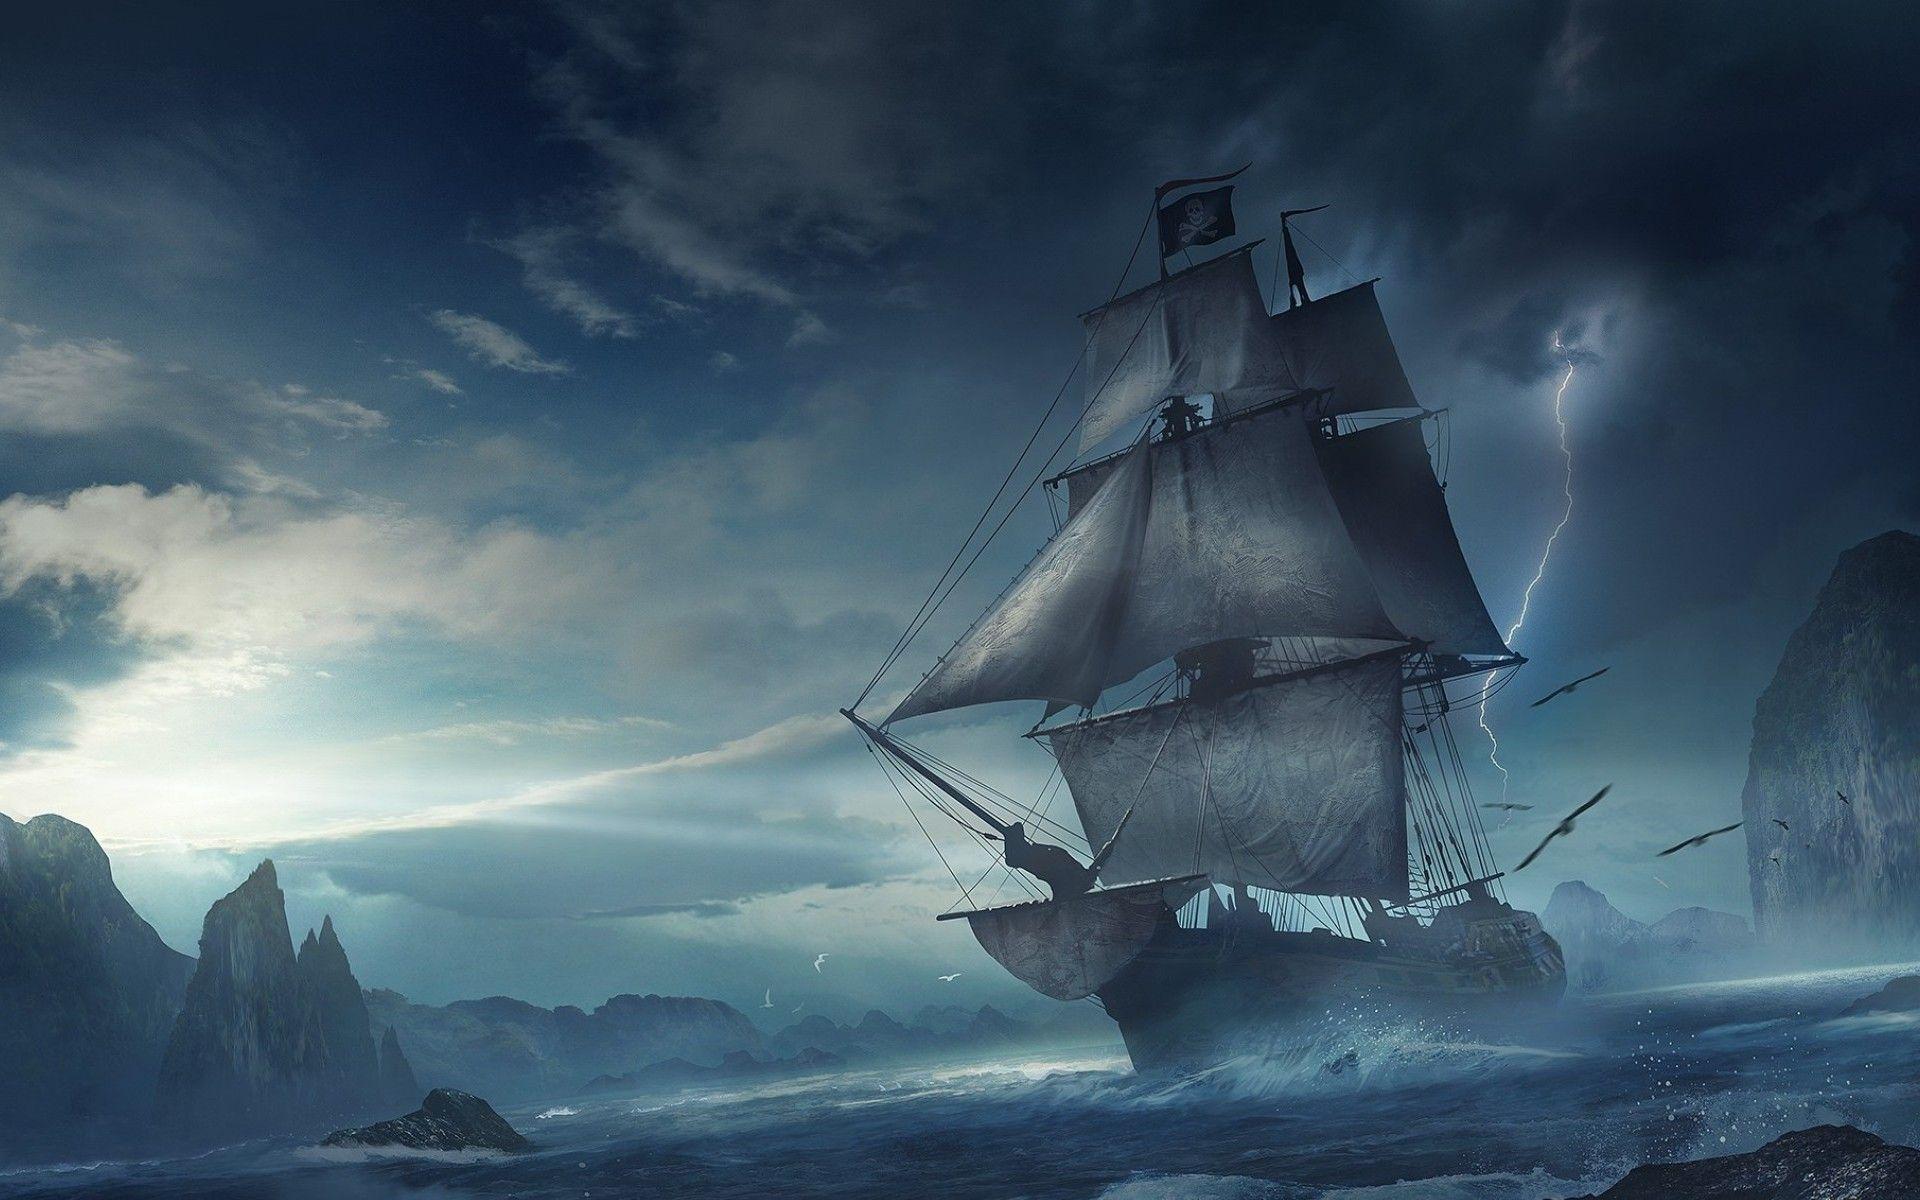 Fantasy ship cliff jolly roger pirate ship rock lightning wallpaper - Pirate Ship Images Fantasy Ship Cliff Jolly Roger Pirate Ship Rock Lightning Wallpaper